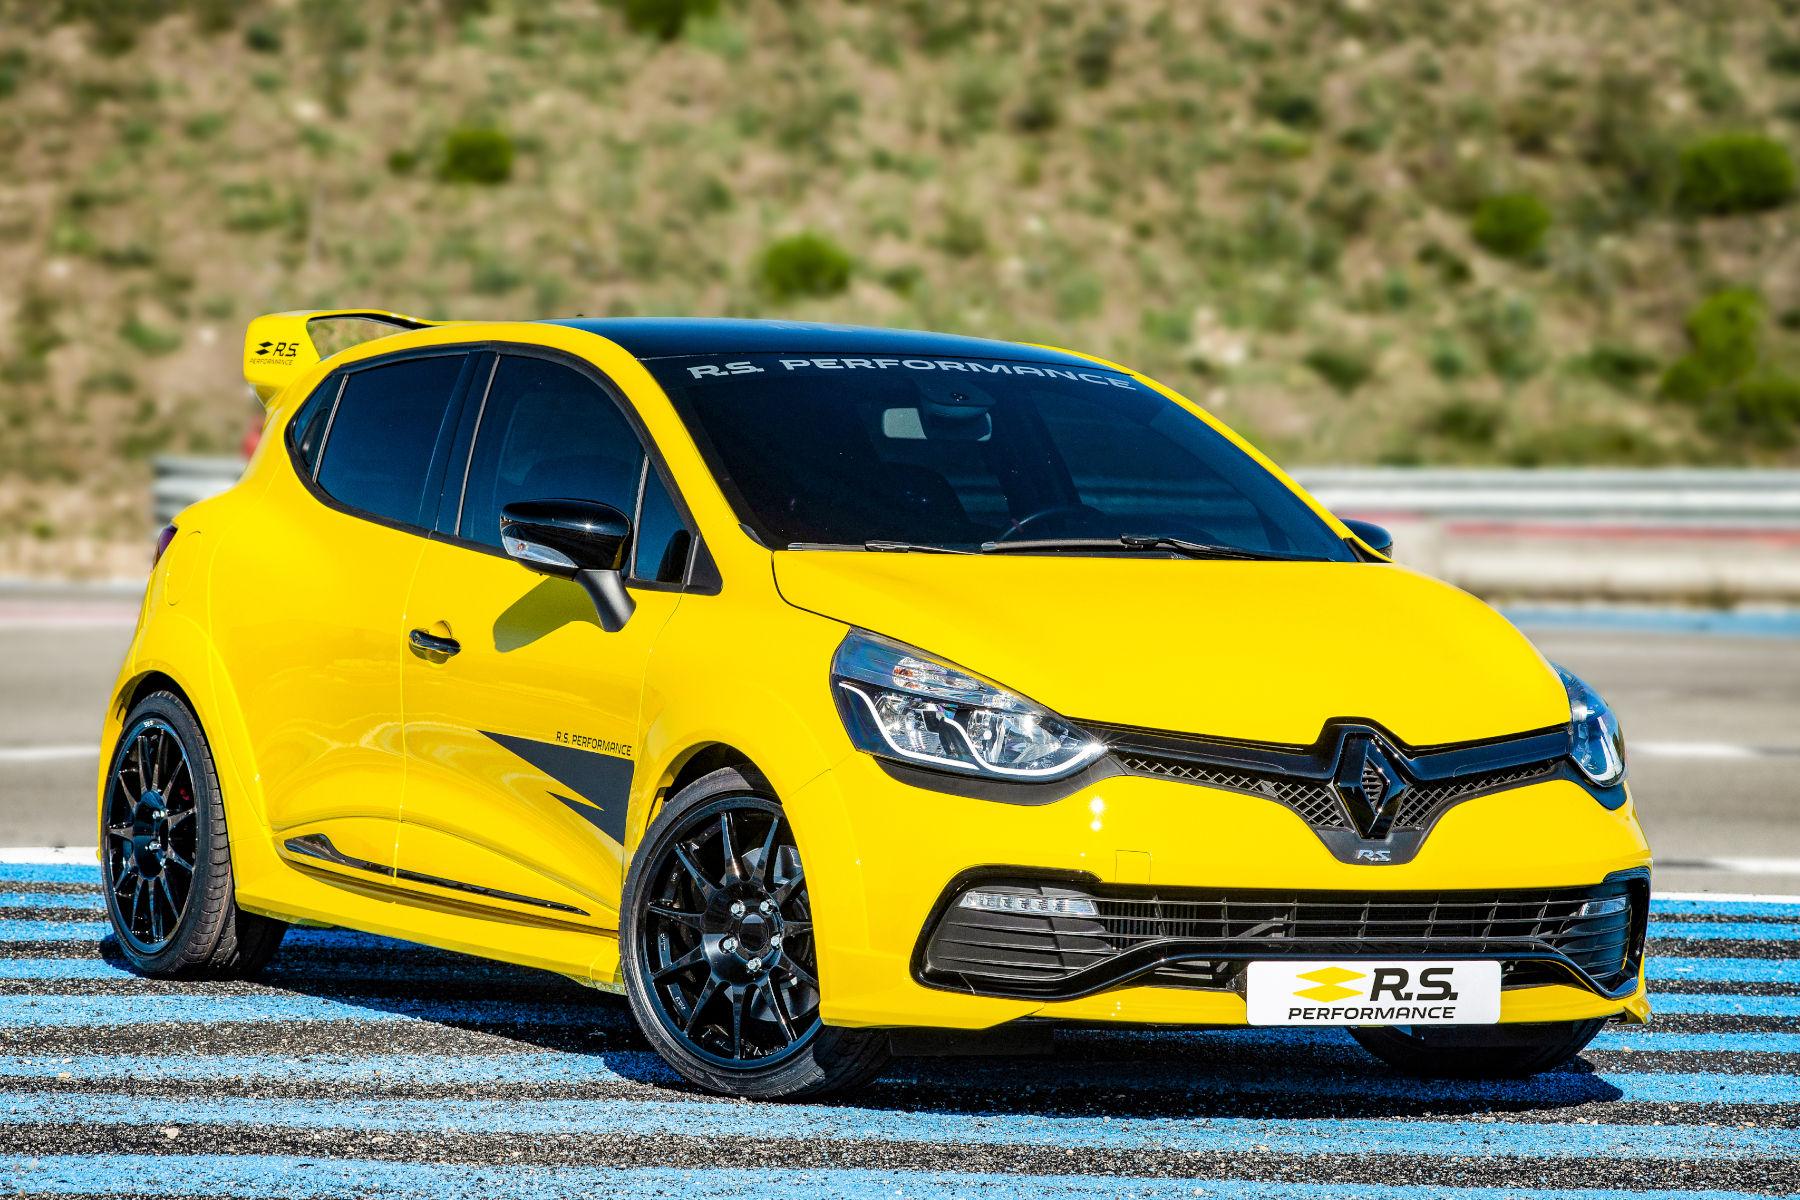 Groupe A craburator kit pour Renault 5 Gt Turbo Kit carburateur GrA